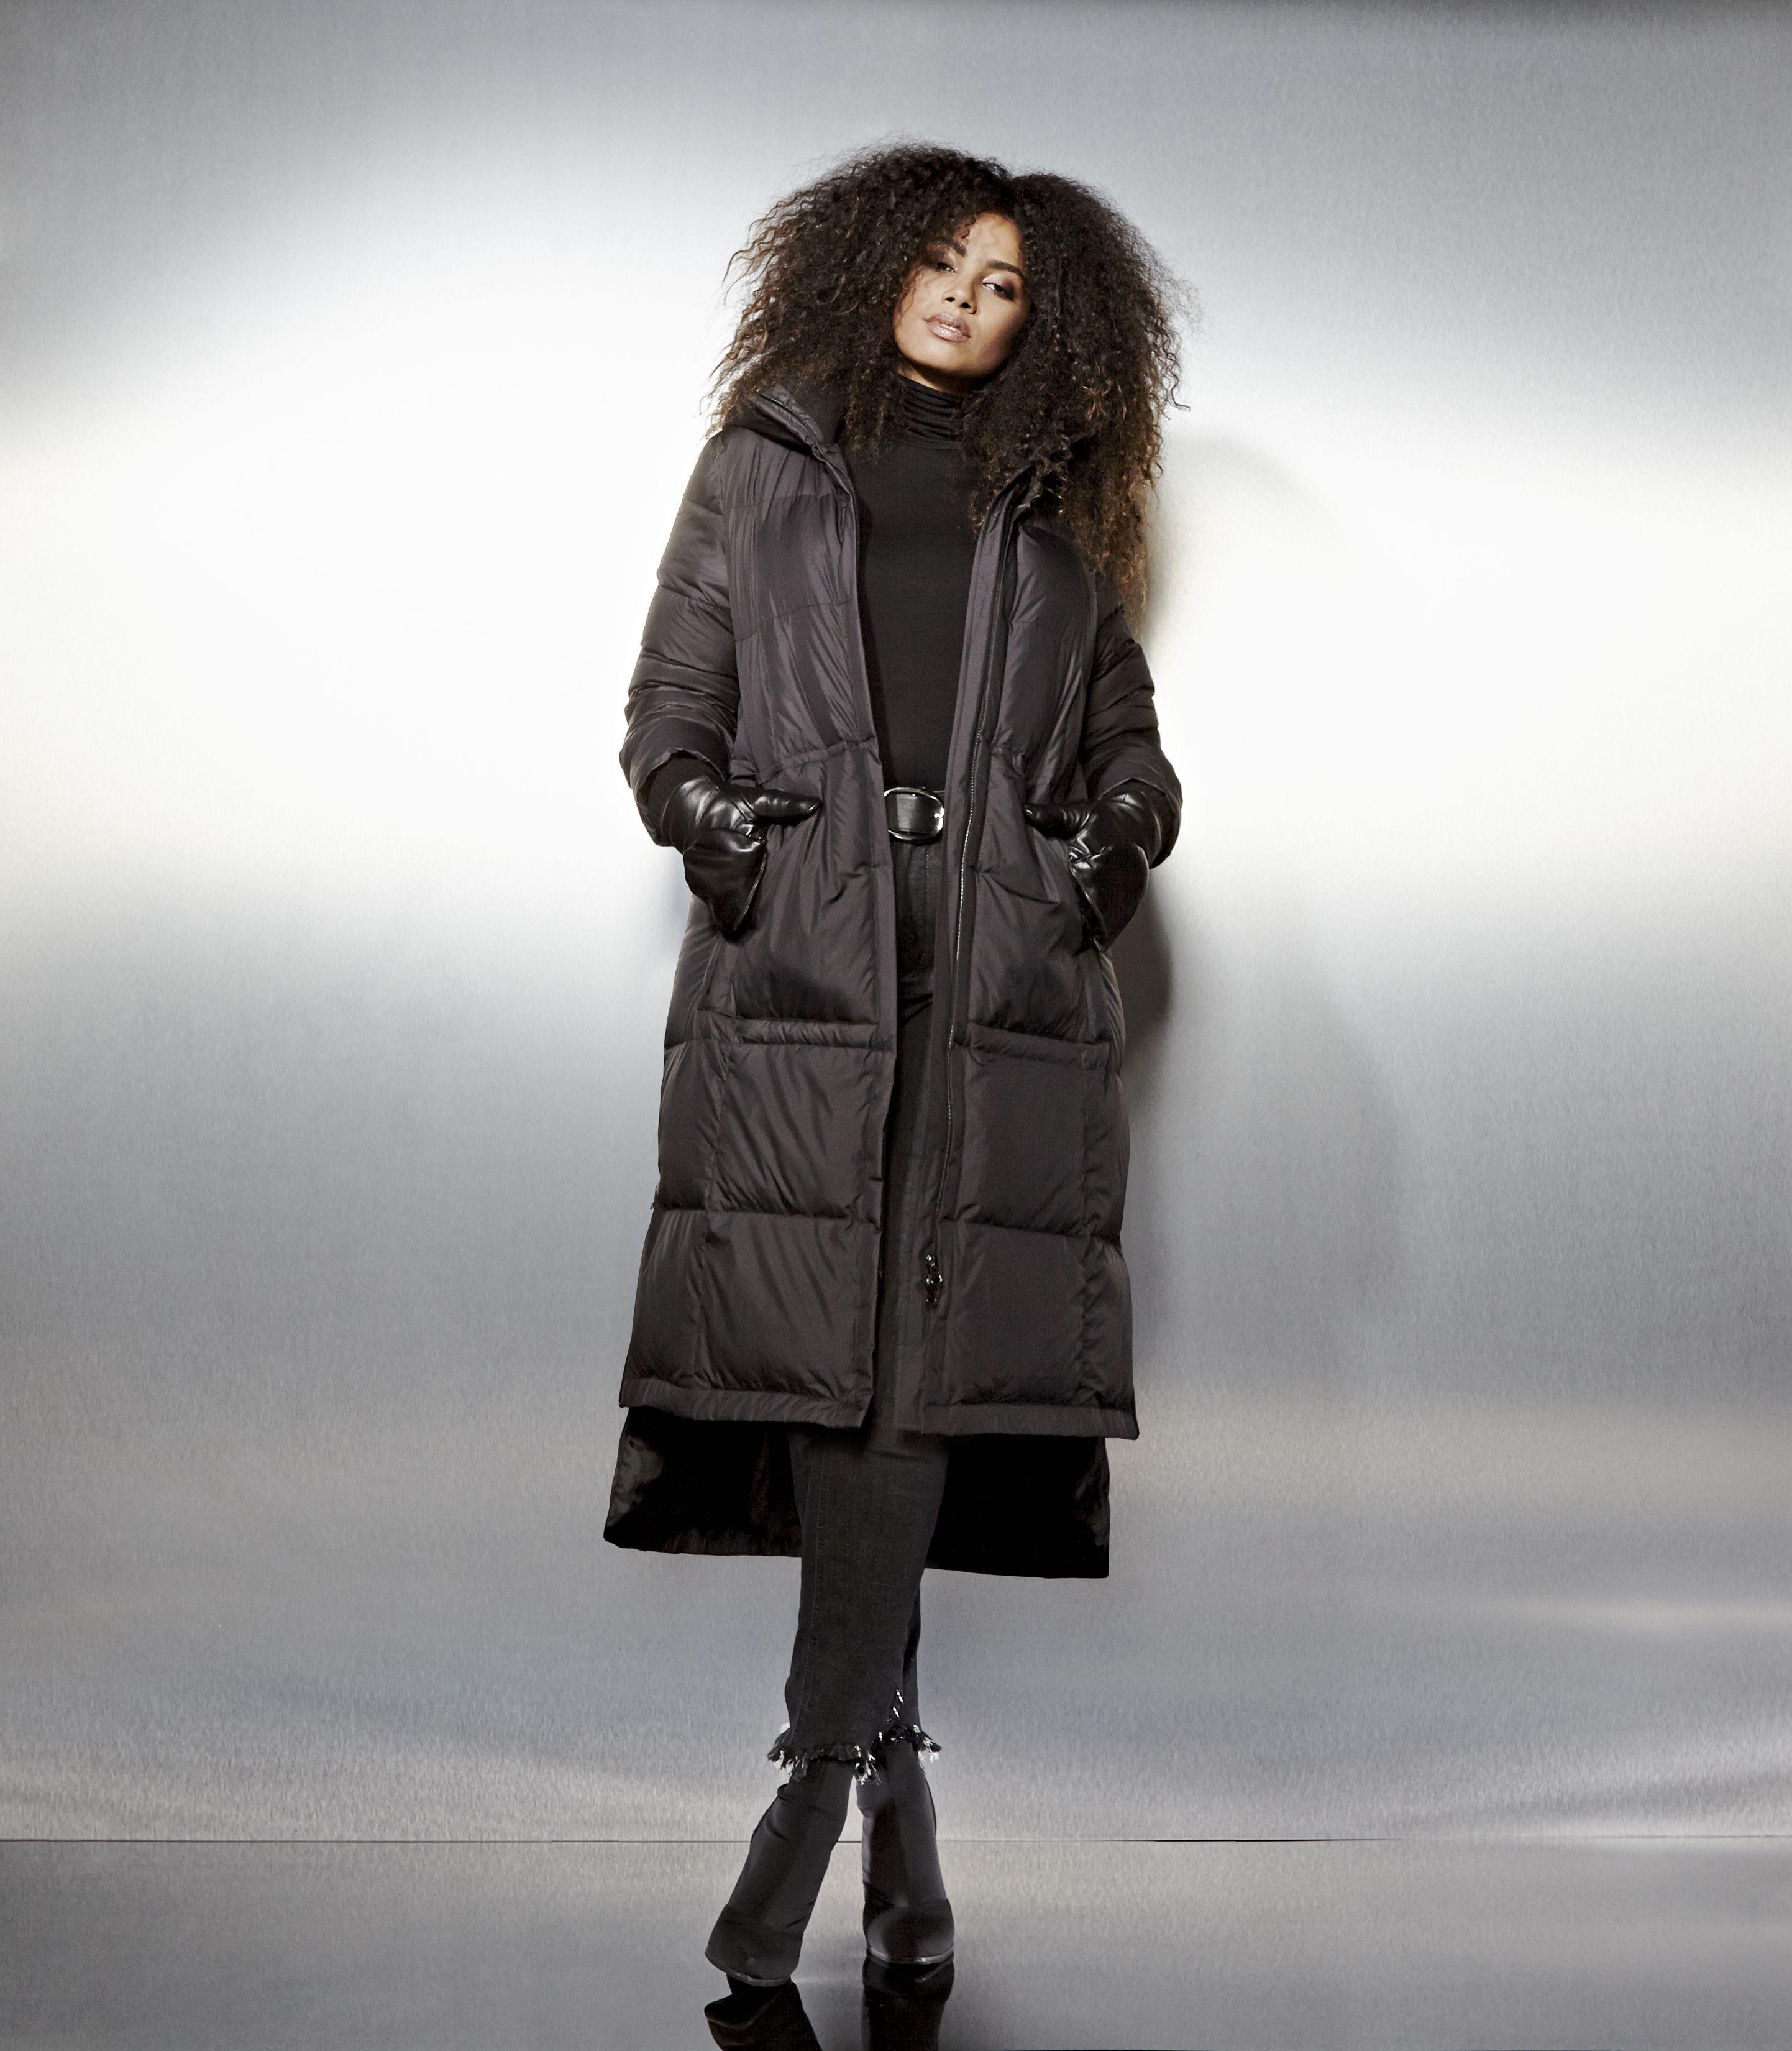 Livik Long Puffer Winter Coat Plus Size Coats Plus Size Outfits Plus Size Outerwear [ 3300 x 2884 Pixel ]